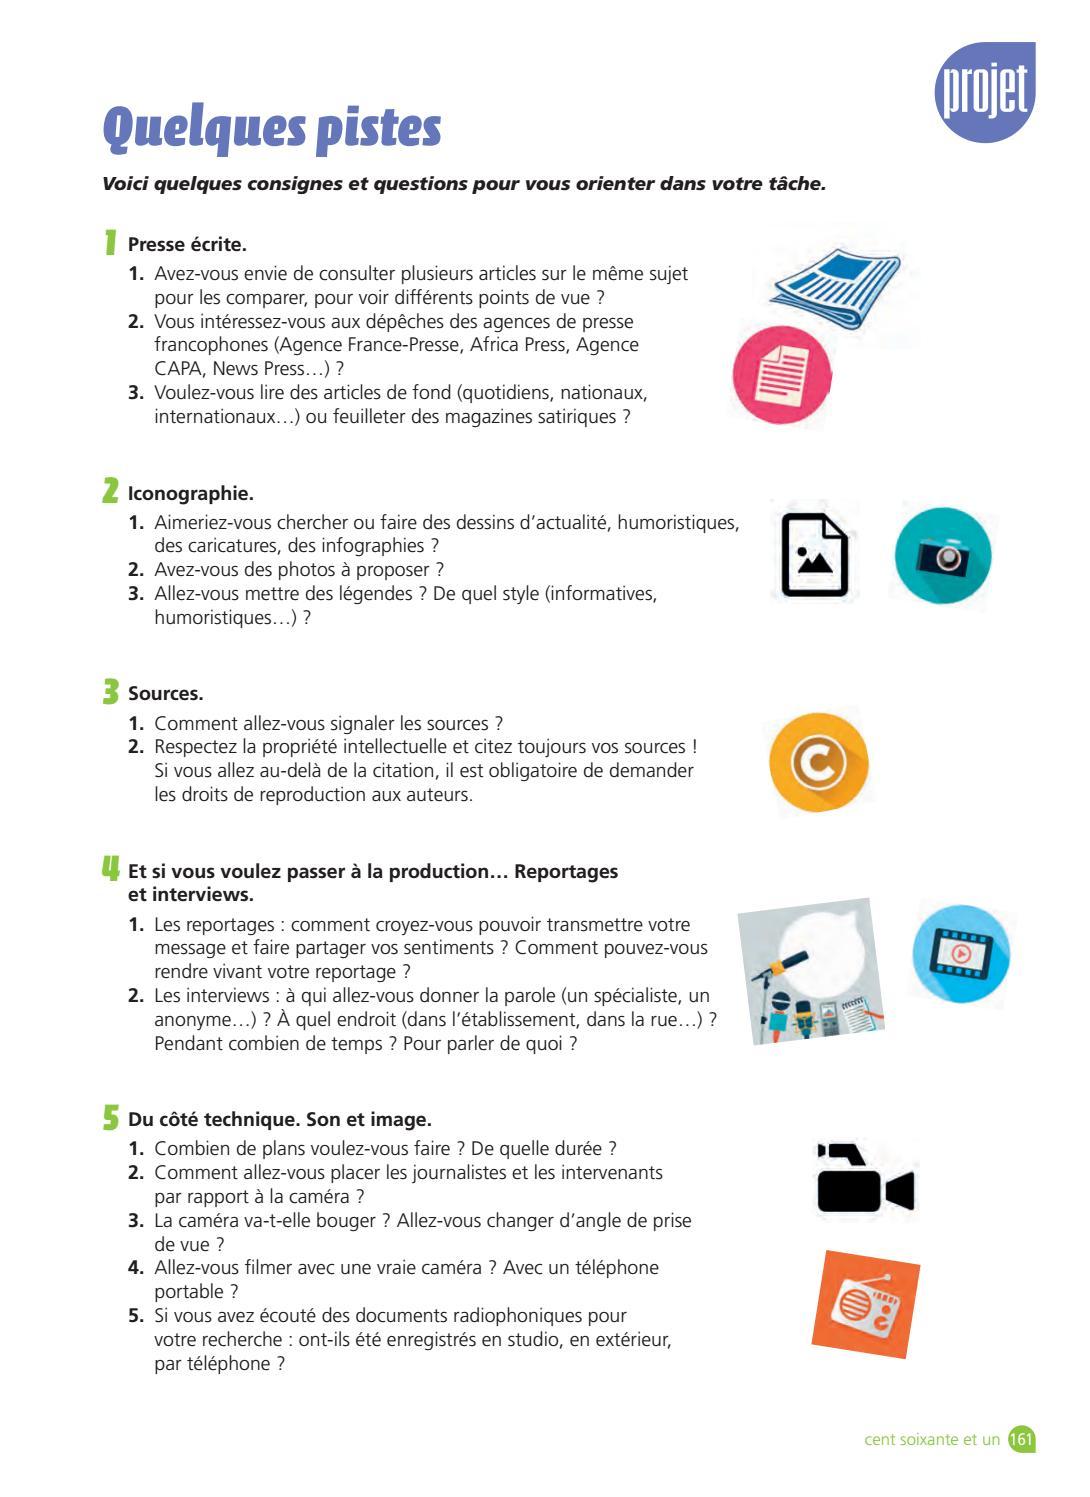 Feuilleter Magazine Point De Vue : feuilleter, magazine, point, Nickel, LIVRE, L'ÉLÈVE, Extraits, Marketing, Issuu